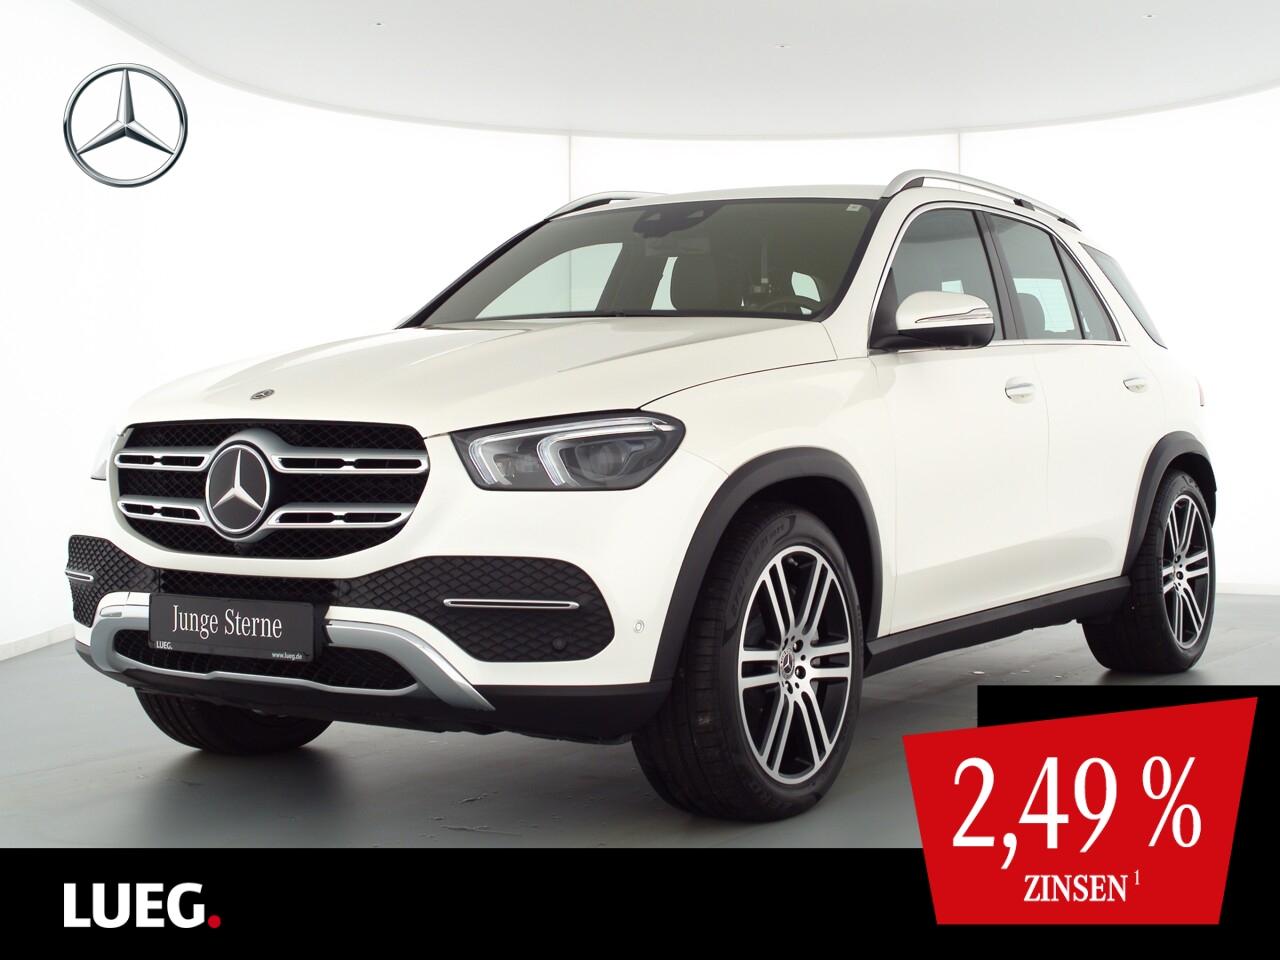 Mercedes-Benz GLE 450 4M MBUX+Mbeam+Distr+HUD+21+Mem+KeyGo+360, Jahr 2019, Benzin